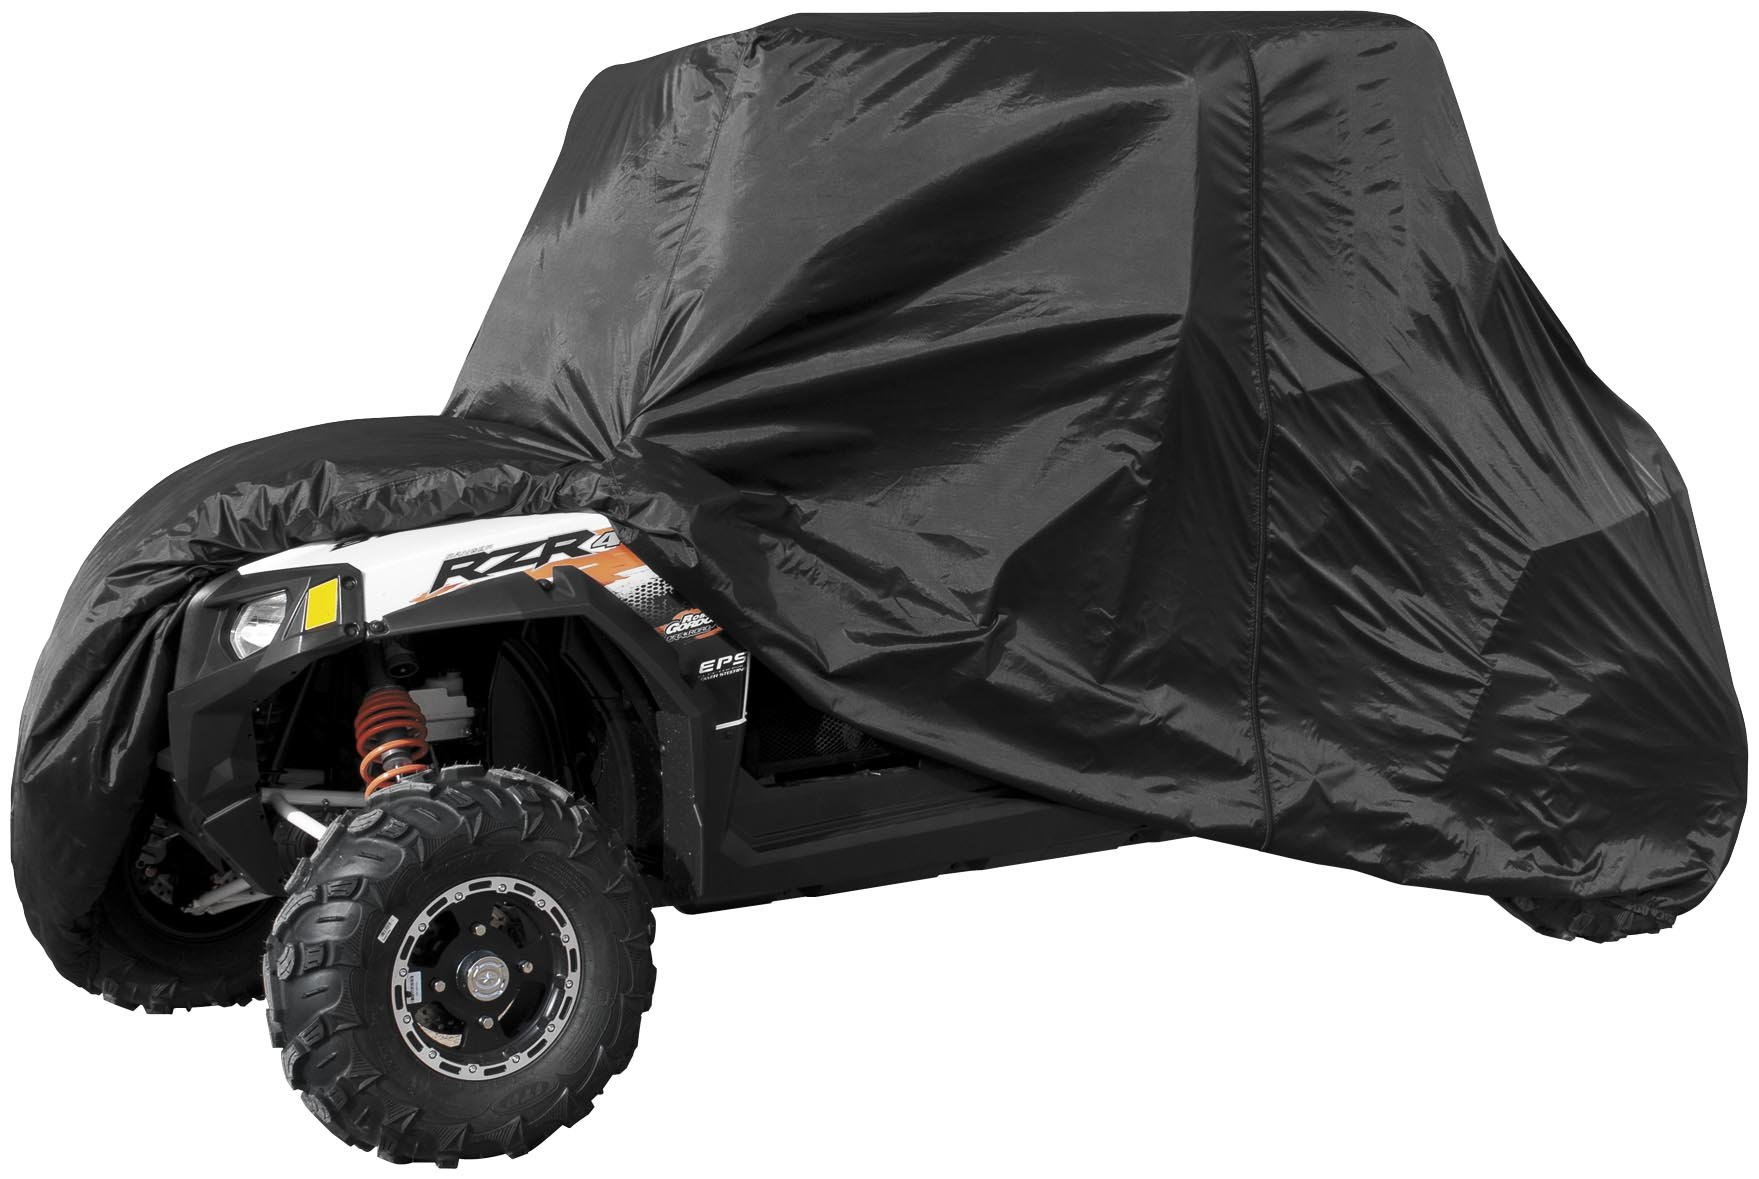 QuadBoss UTV 4-Seater Cover - Black by QUADBOSS